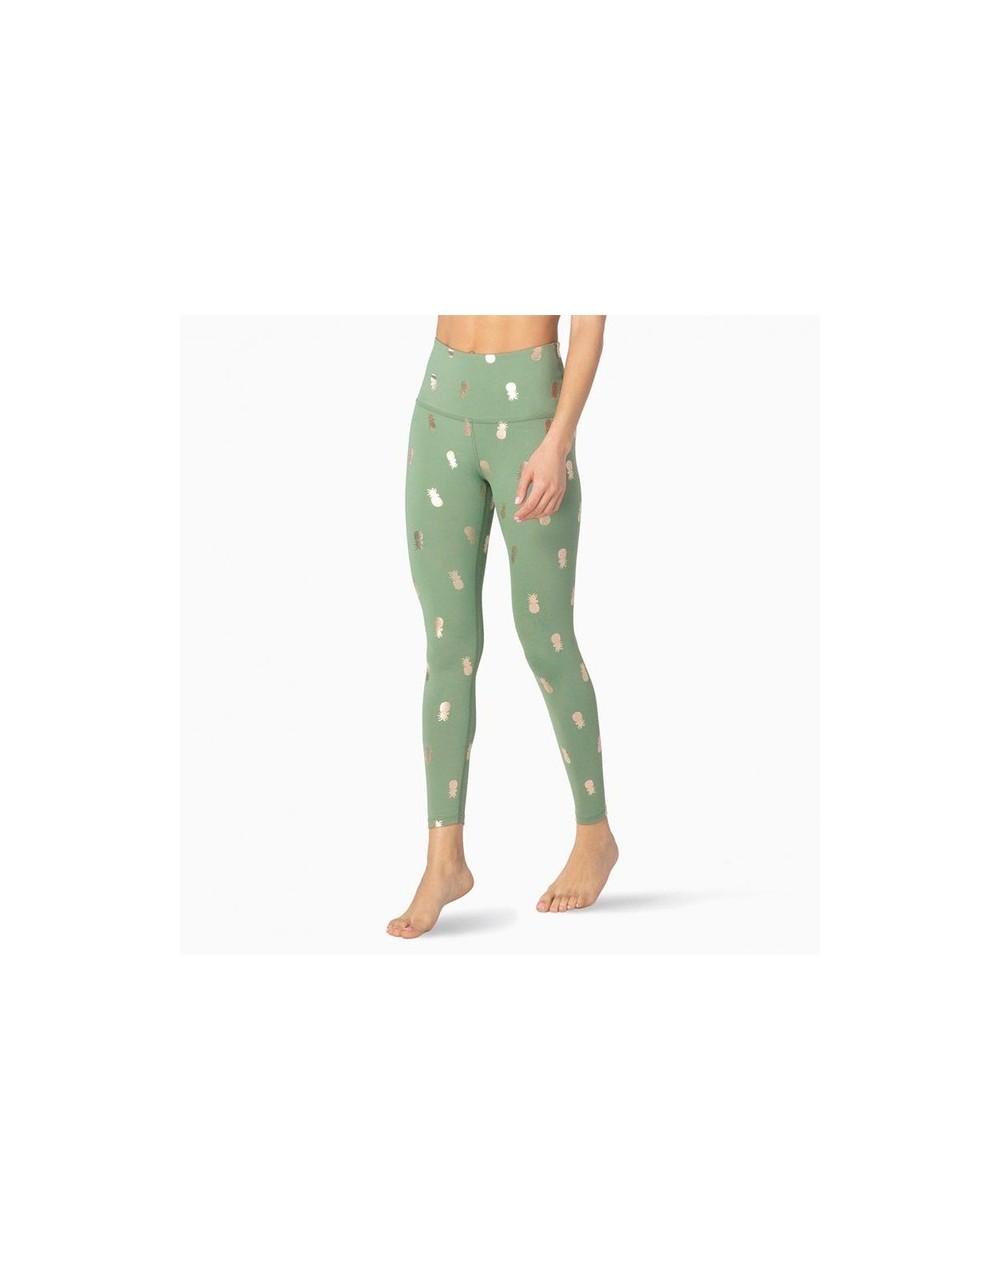 Heart Shape Leggings Women New Red Black Color High Waist Pants Patchwork Printed Leggins Big Size High Elastic Fitness Legg...